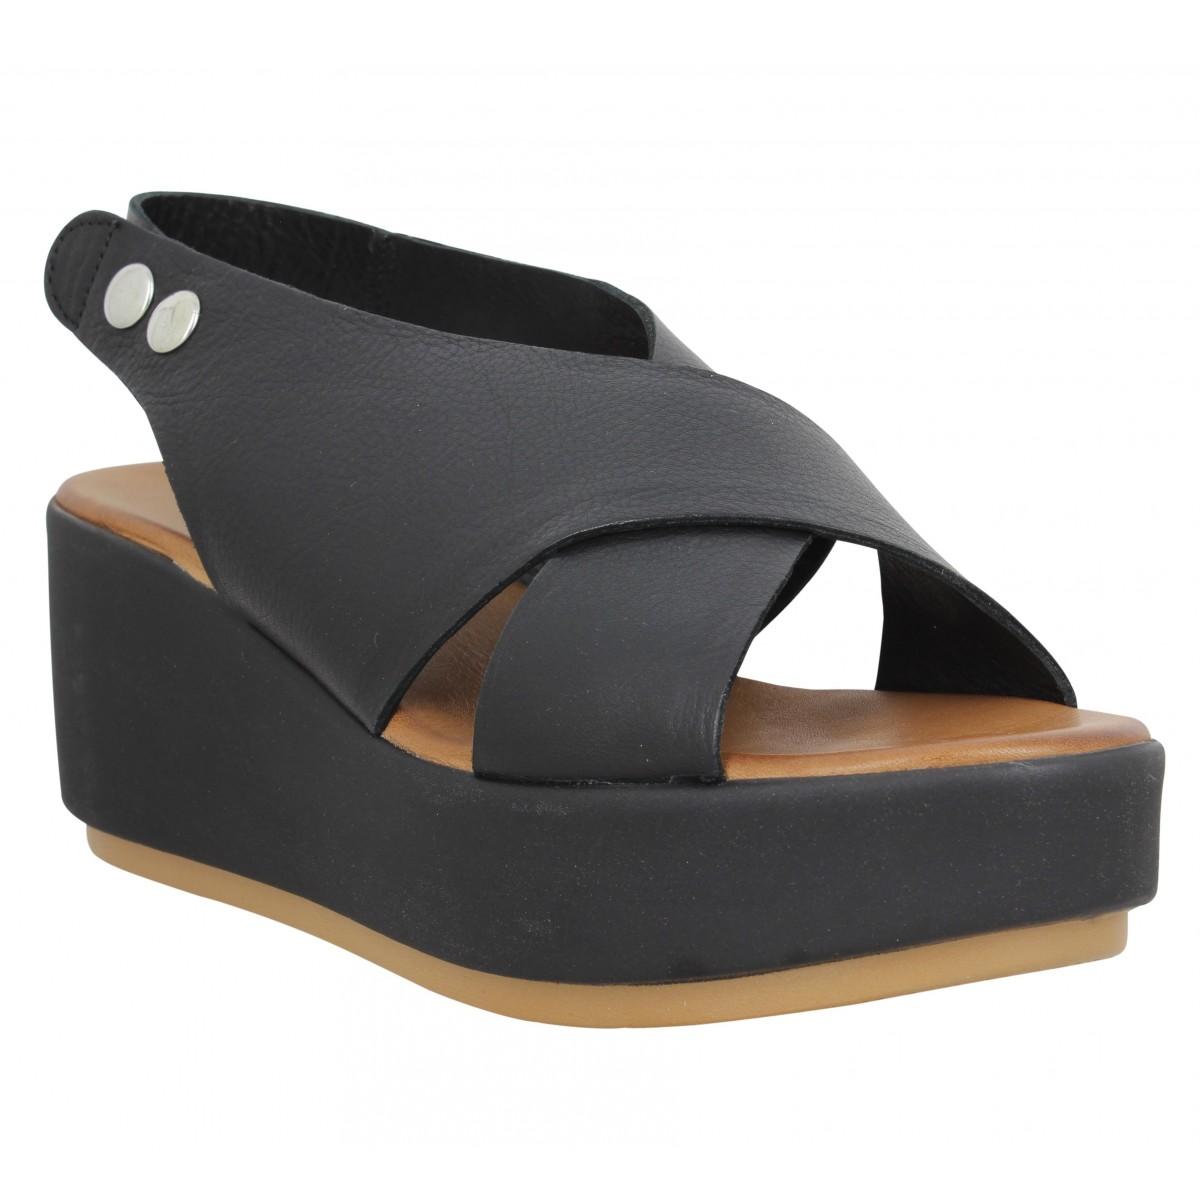 Inuovo Marque 12303 Cuir Femme-35-noir